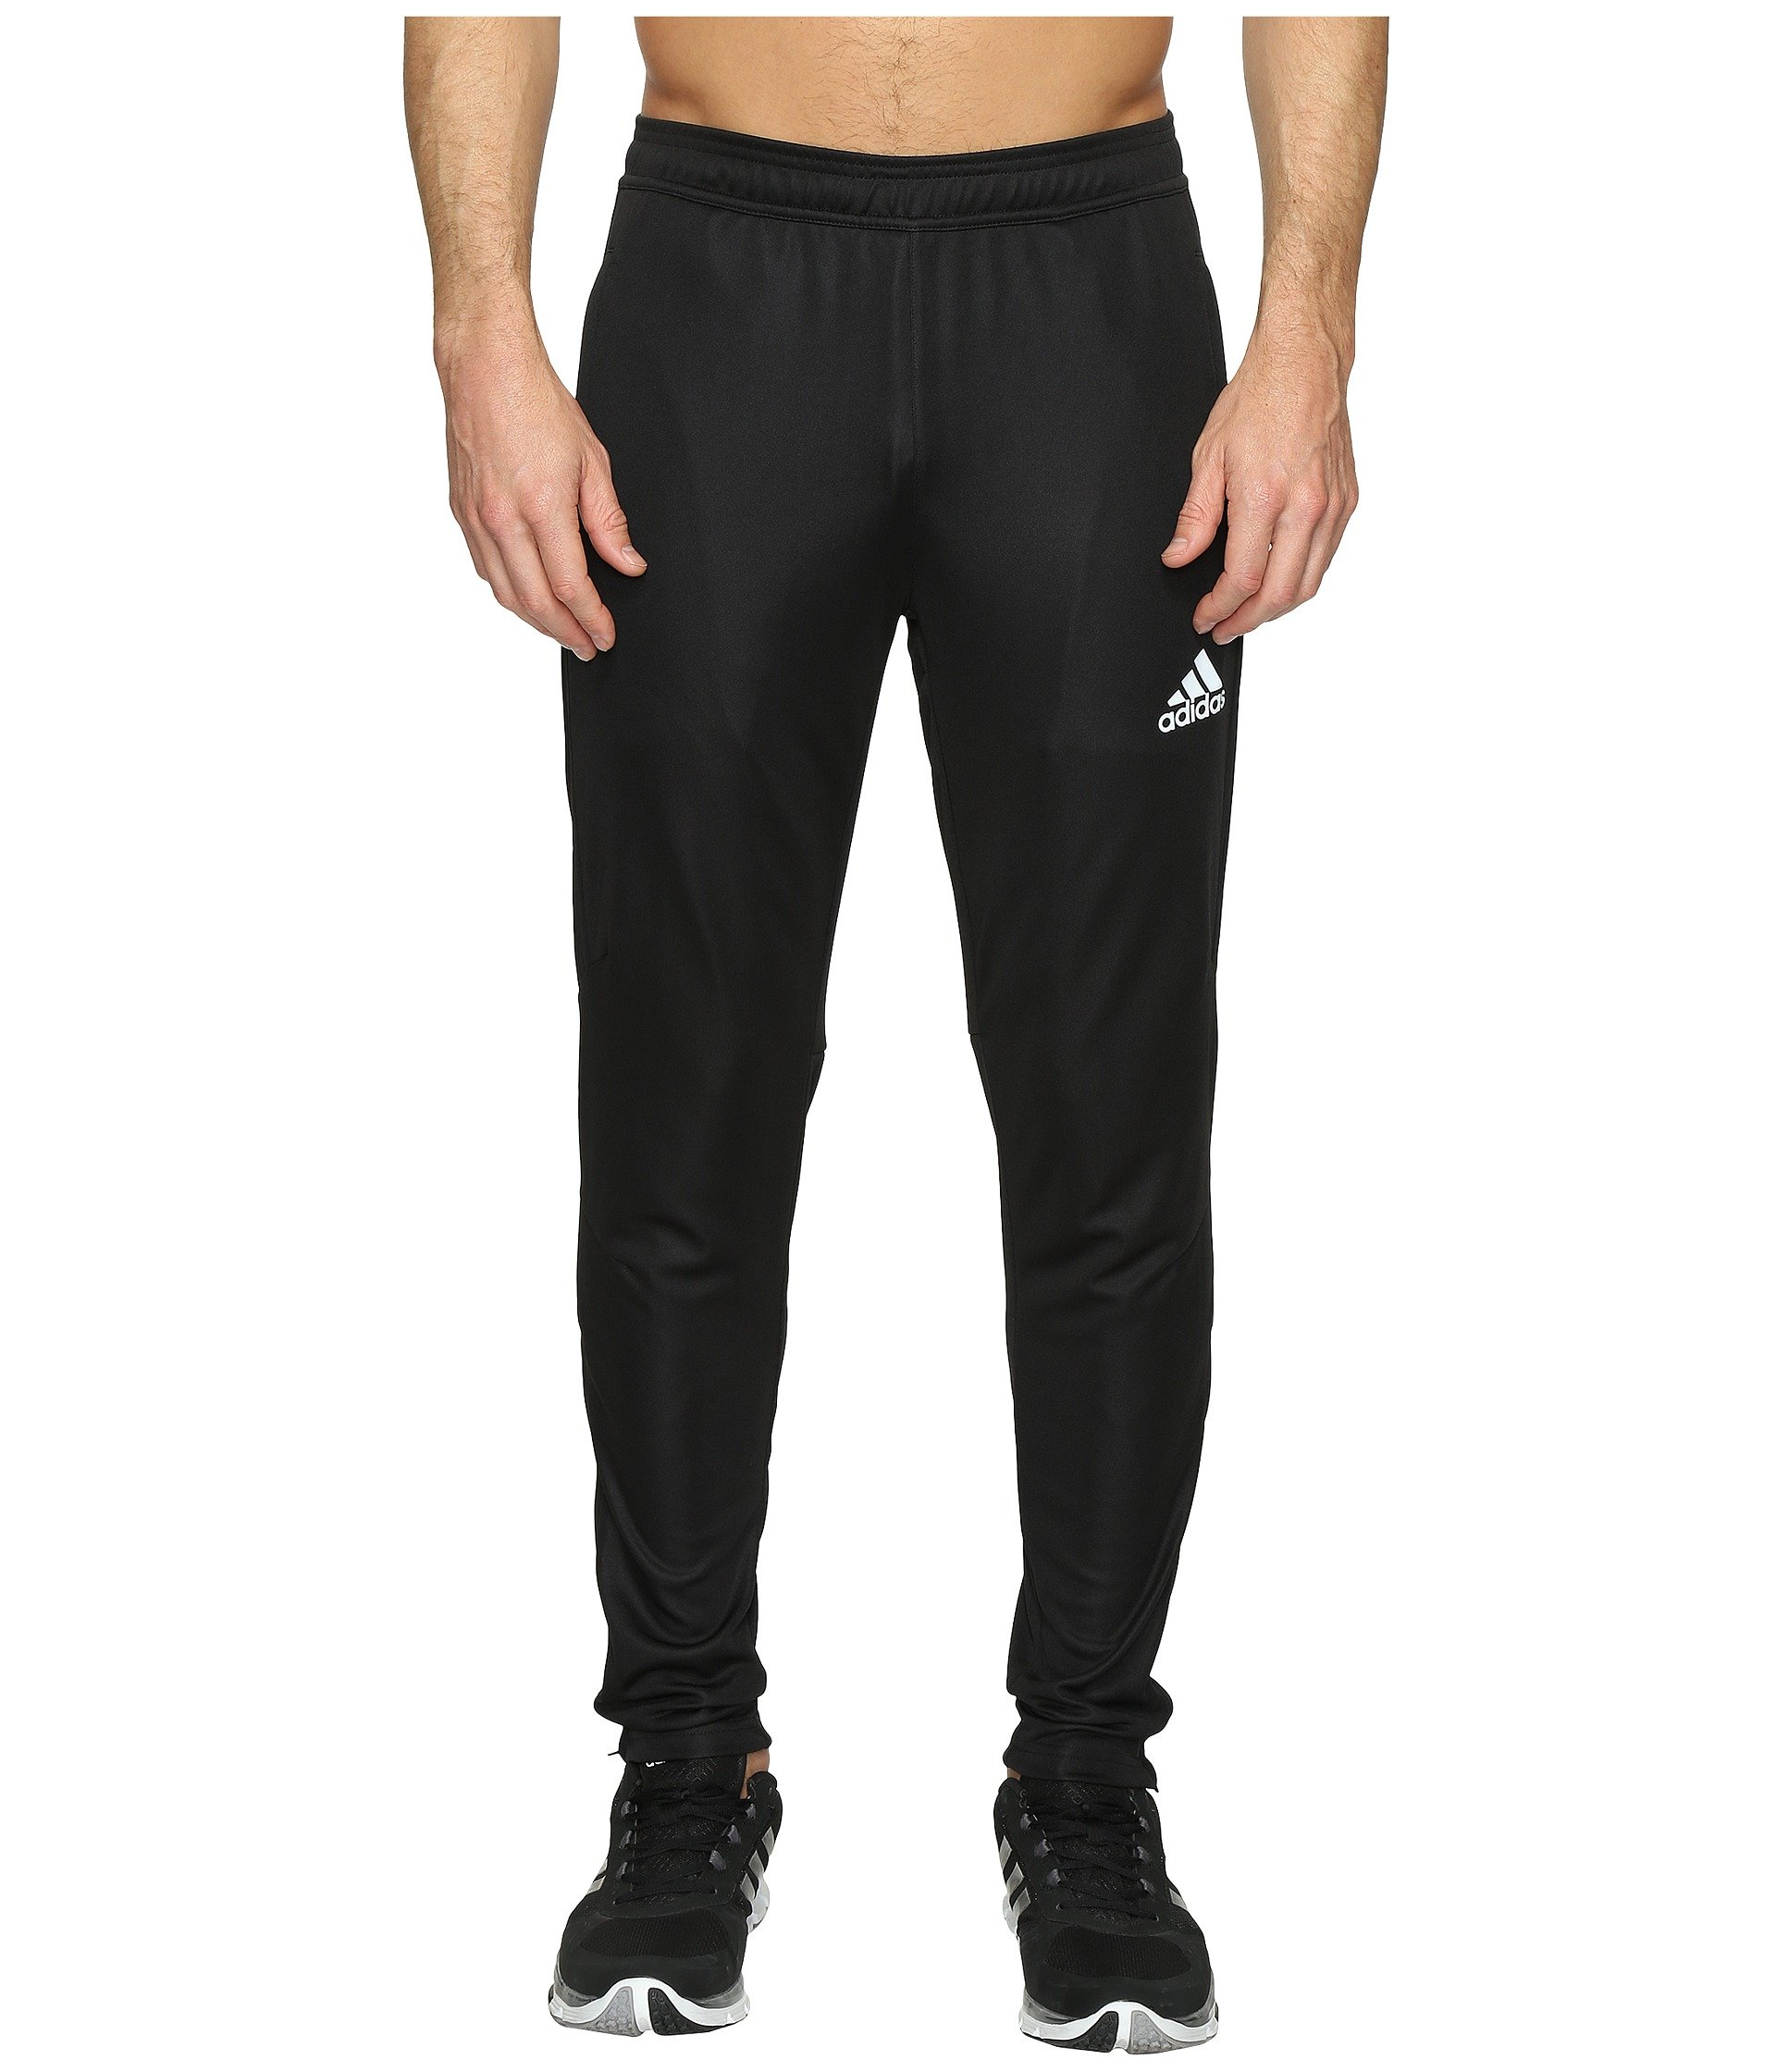 adidas Men's Soccer Tiro 17 Pants, X-Small, Black/White